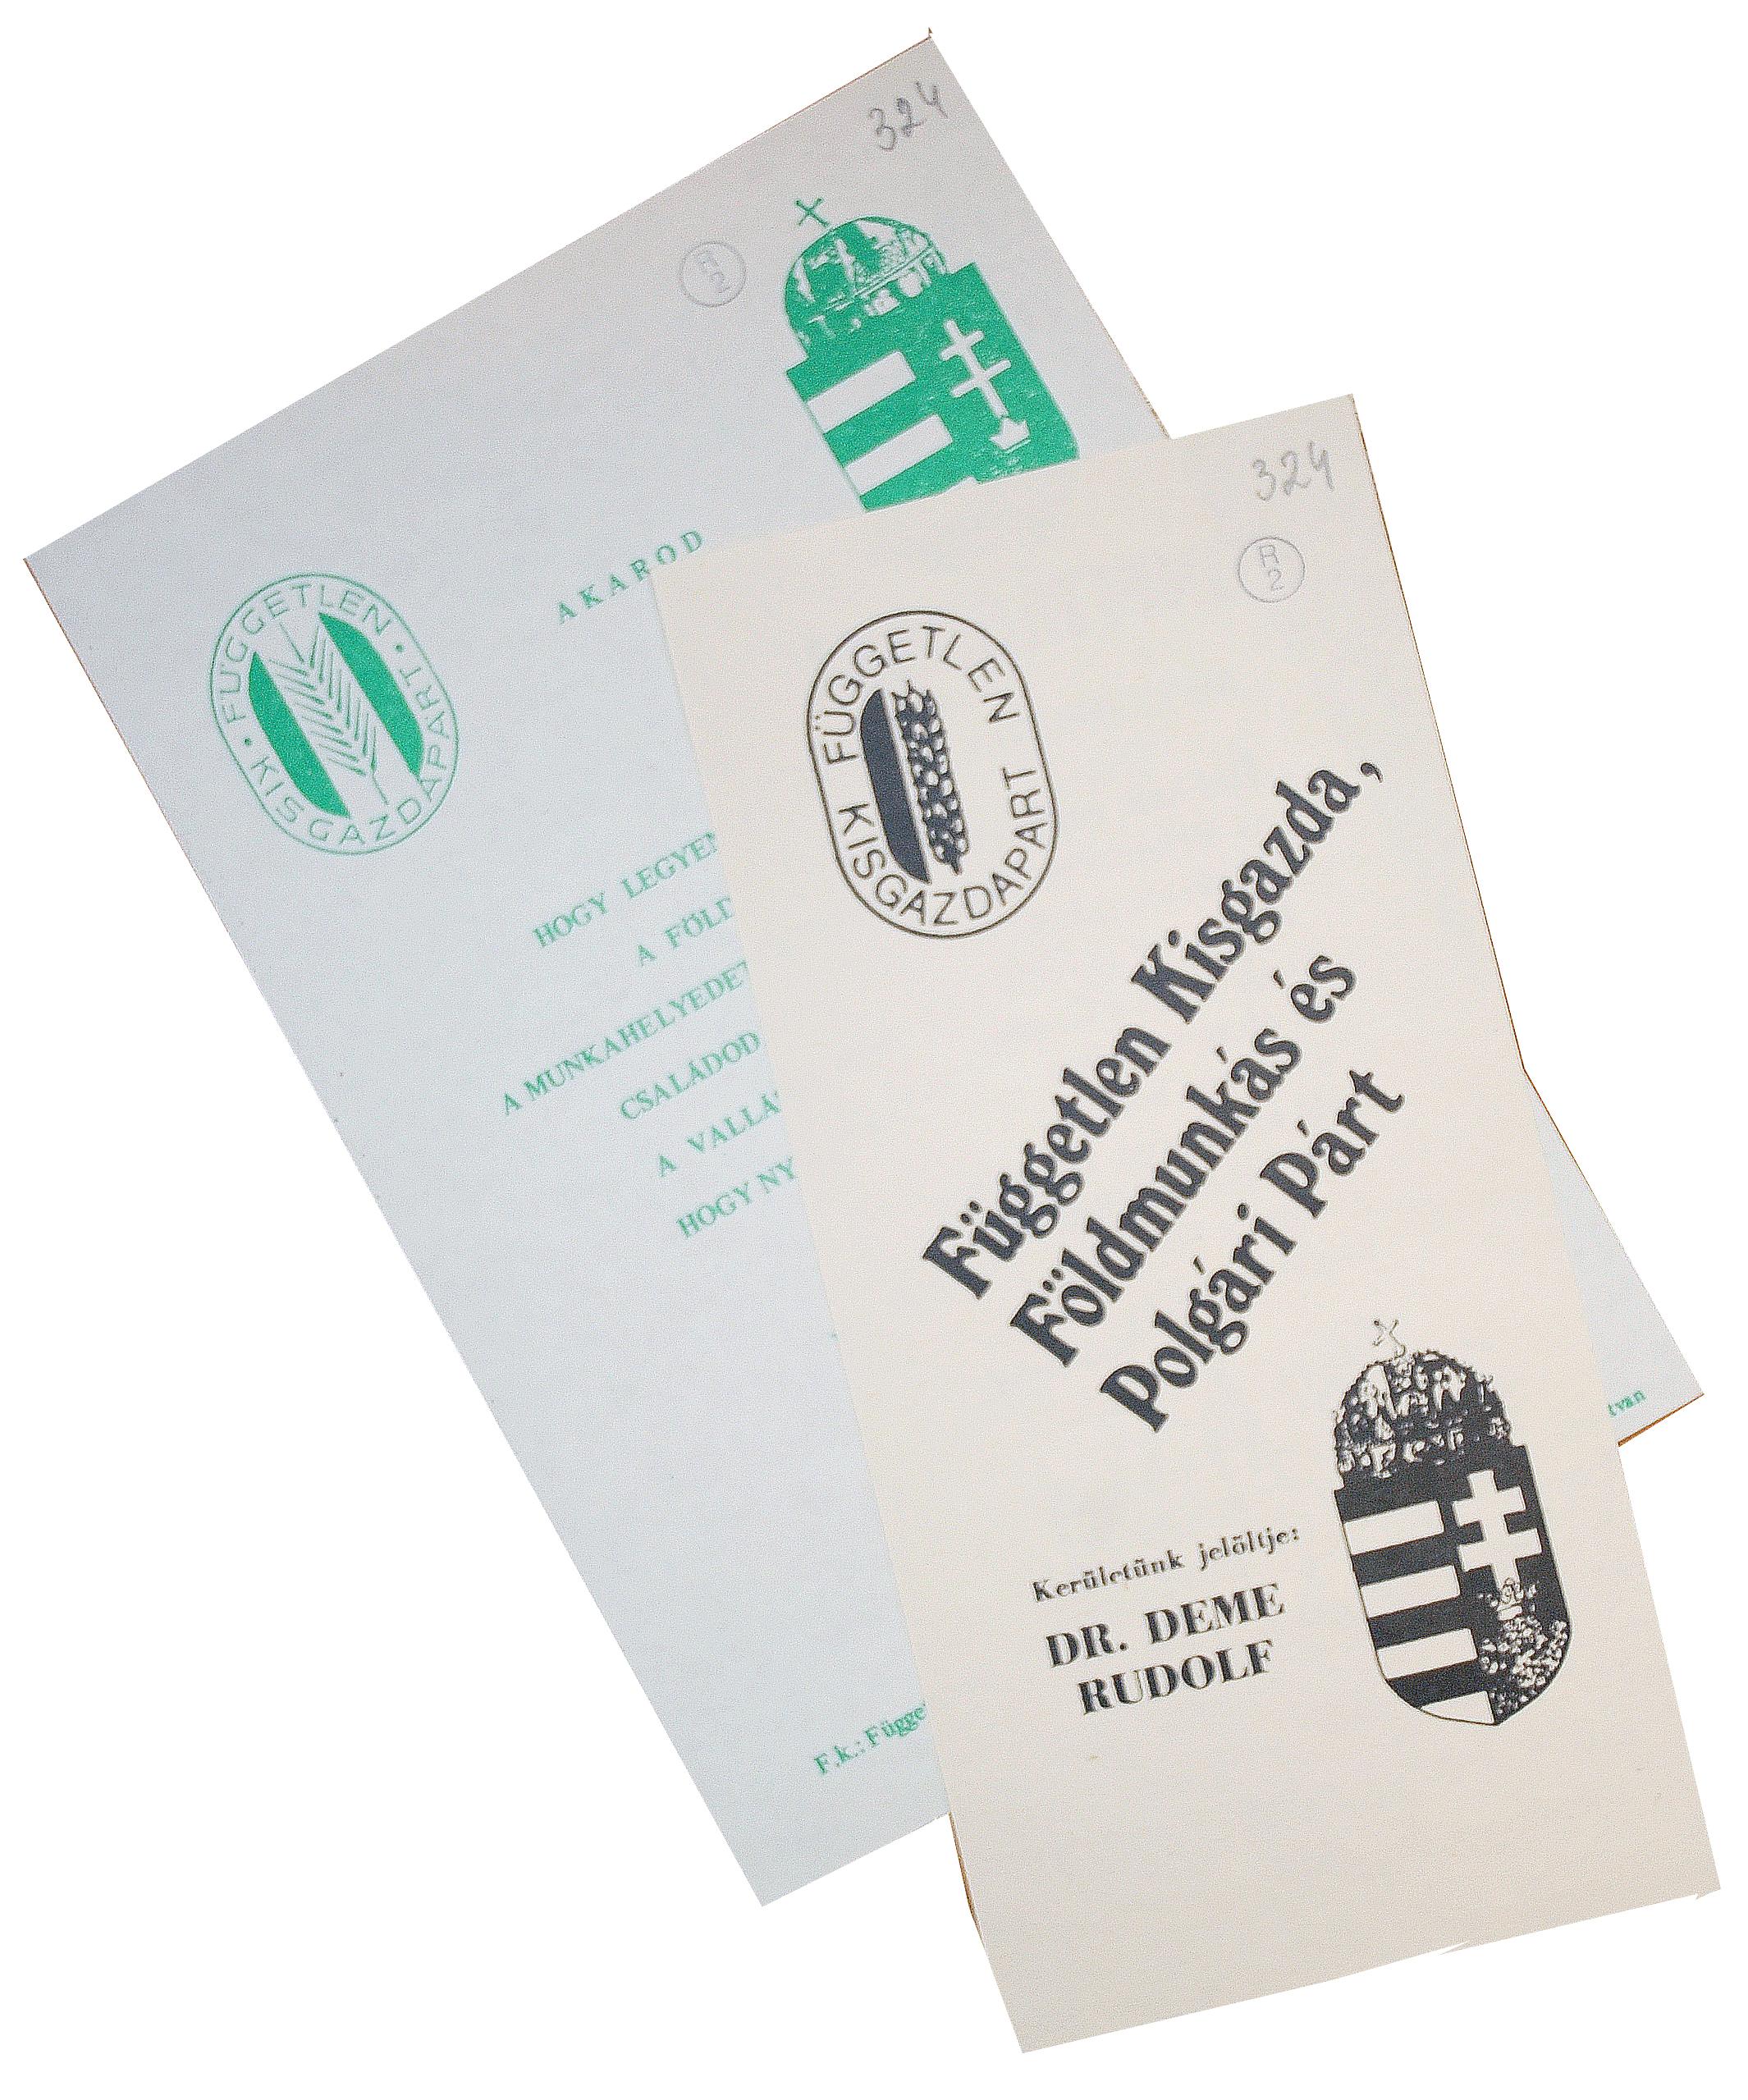 05_fkgp_nemzetikonyvtar.JPG